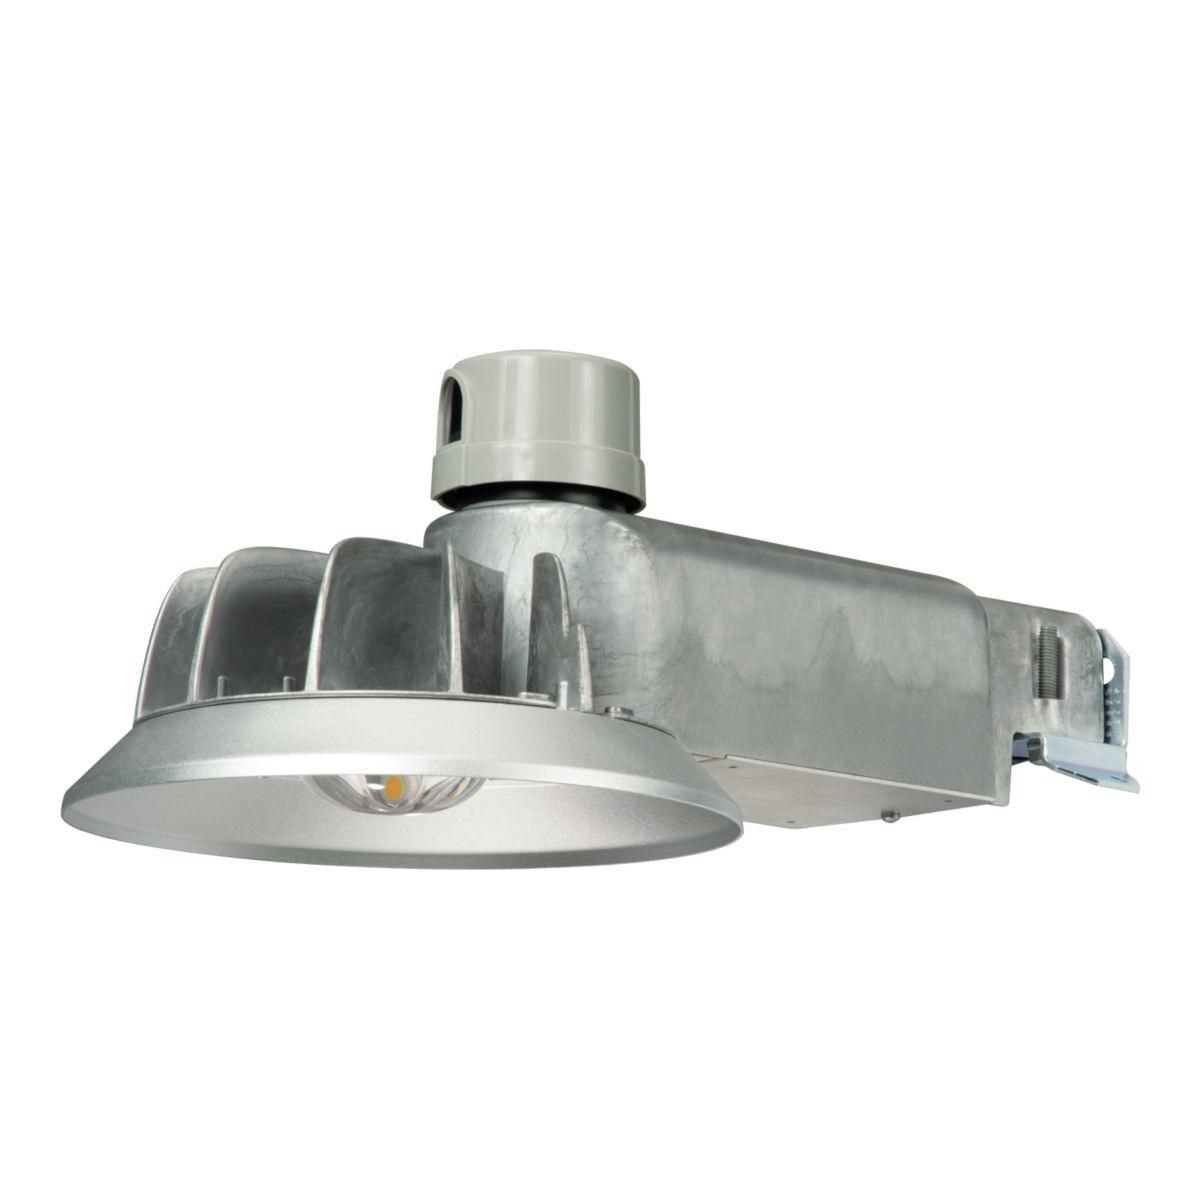 CTKR Caretaker LED